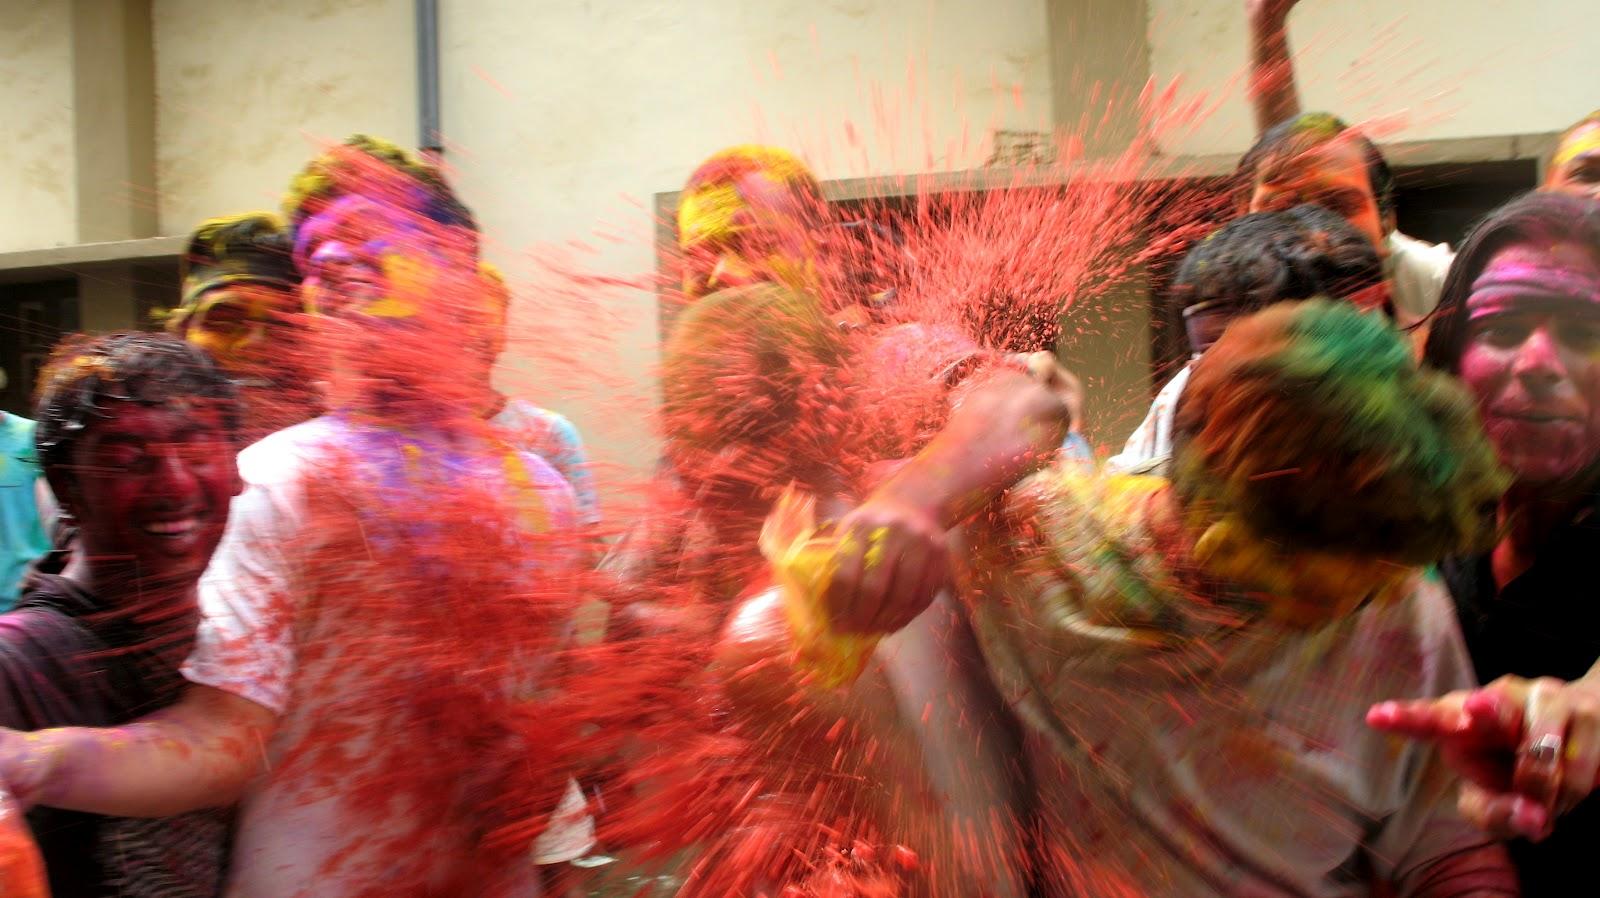 http://2.bp.blogspot.com/-ahU-LSrhNi4/T03HWQwEVkI/AAAAAAAAAYw/qYq9KabLovs/s1600/Pune+city+Events.jpg